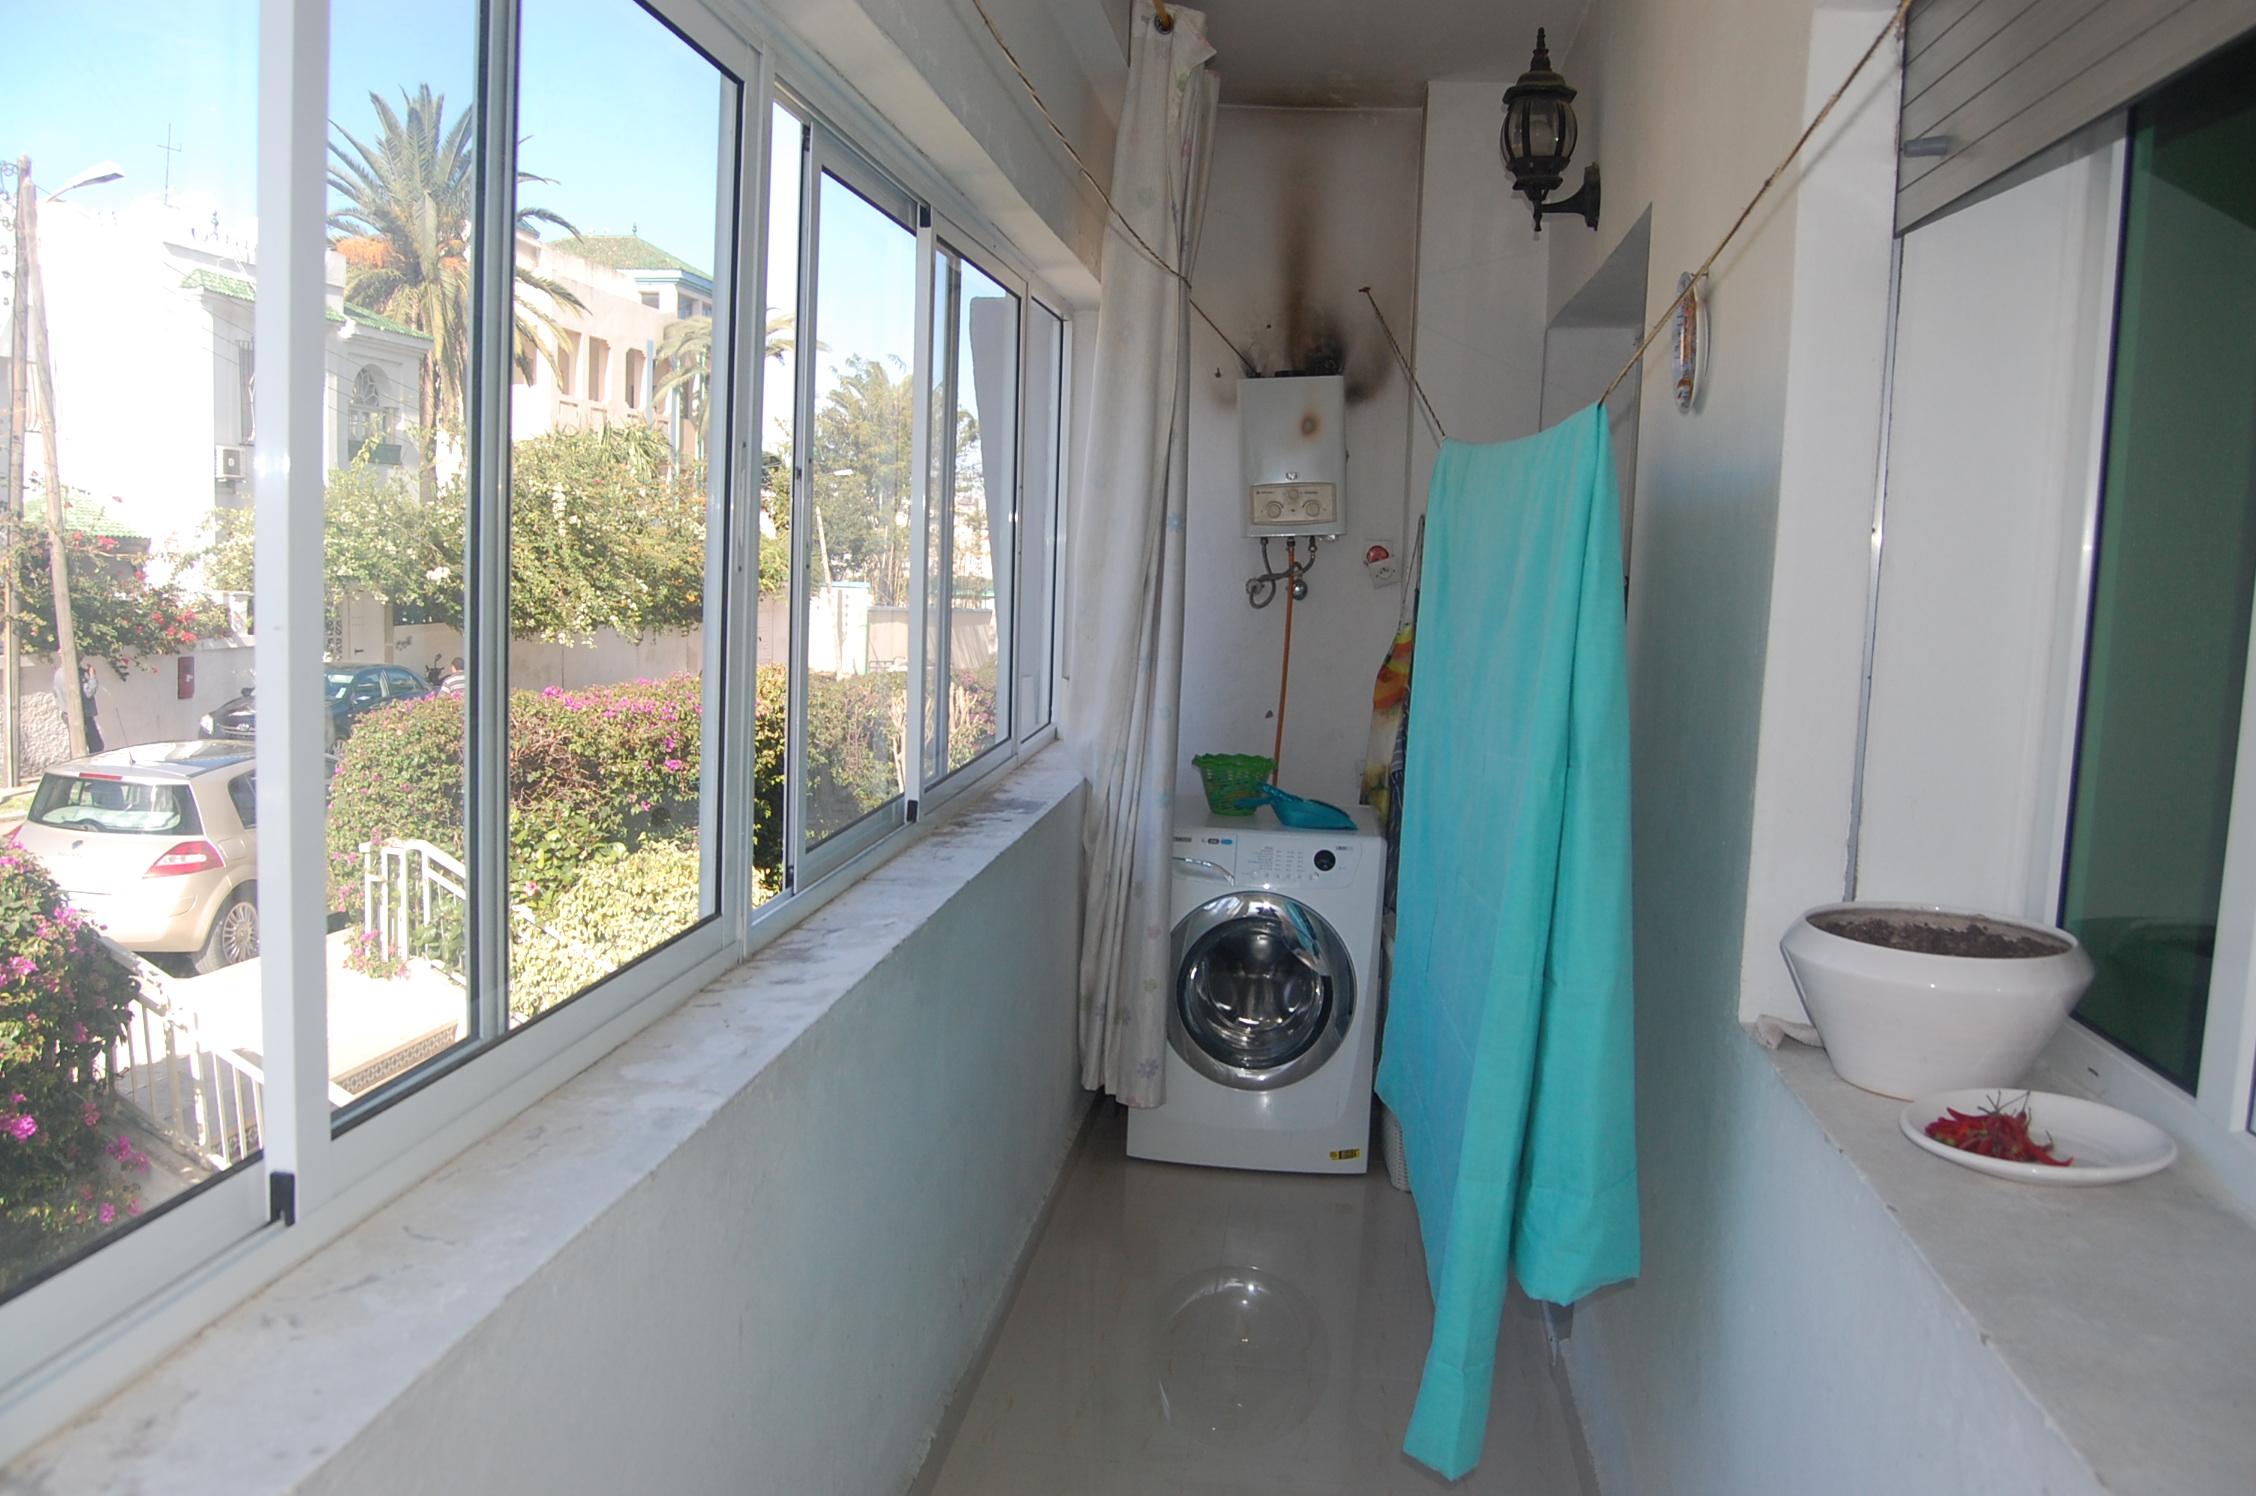 9-vente-appartement-tanger-route-de-tetouan-buanderie-va460-villart-immo